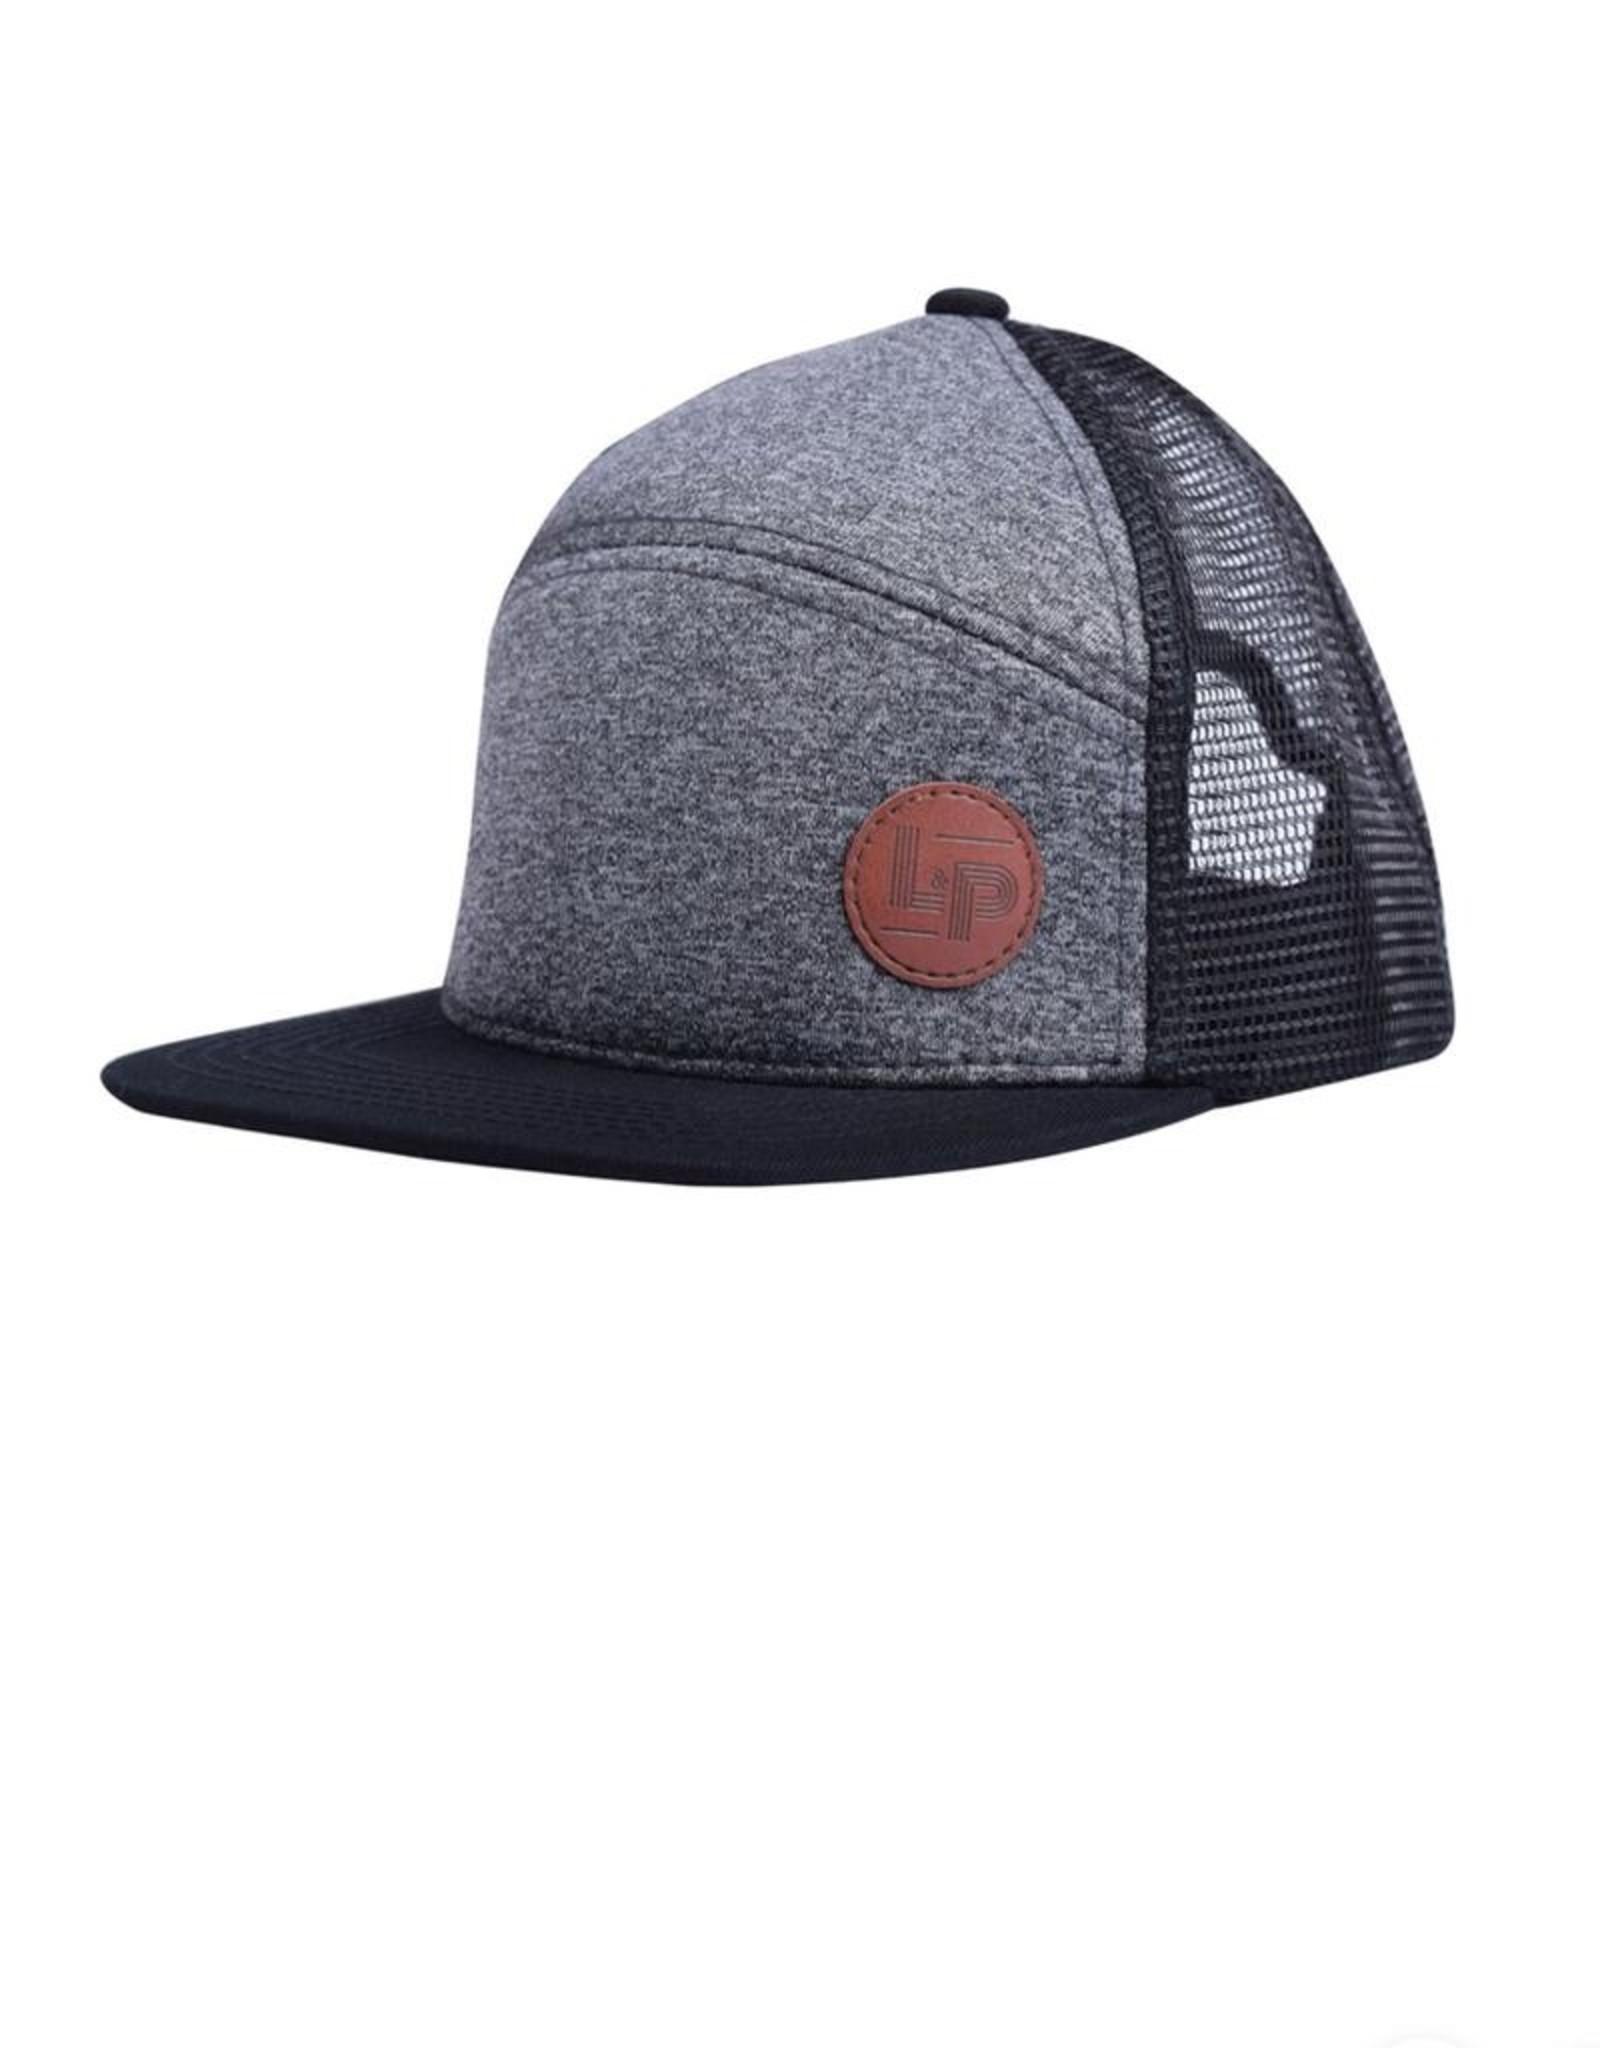 L&P Apparel Dark Grey & Black Orleans Snapback Cap